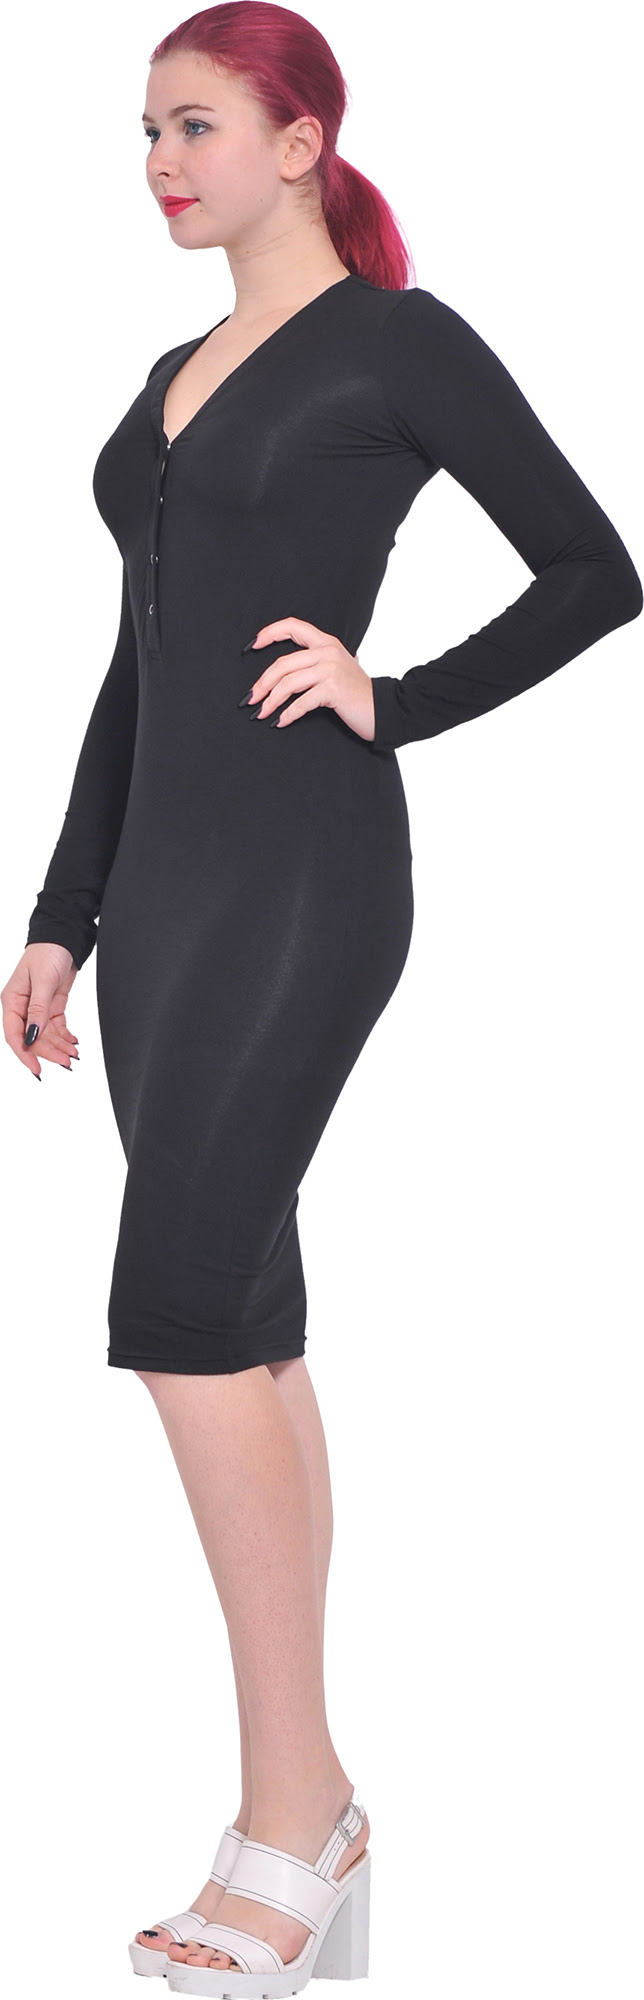 Bodycon long dress length sleeve knee shoulder surgery penney